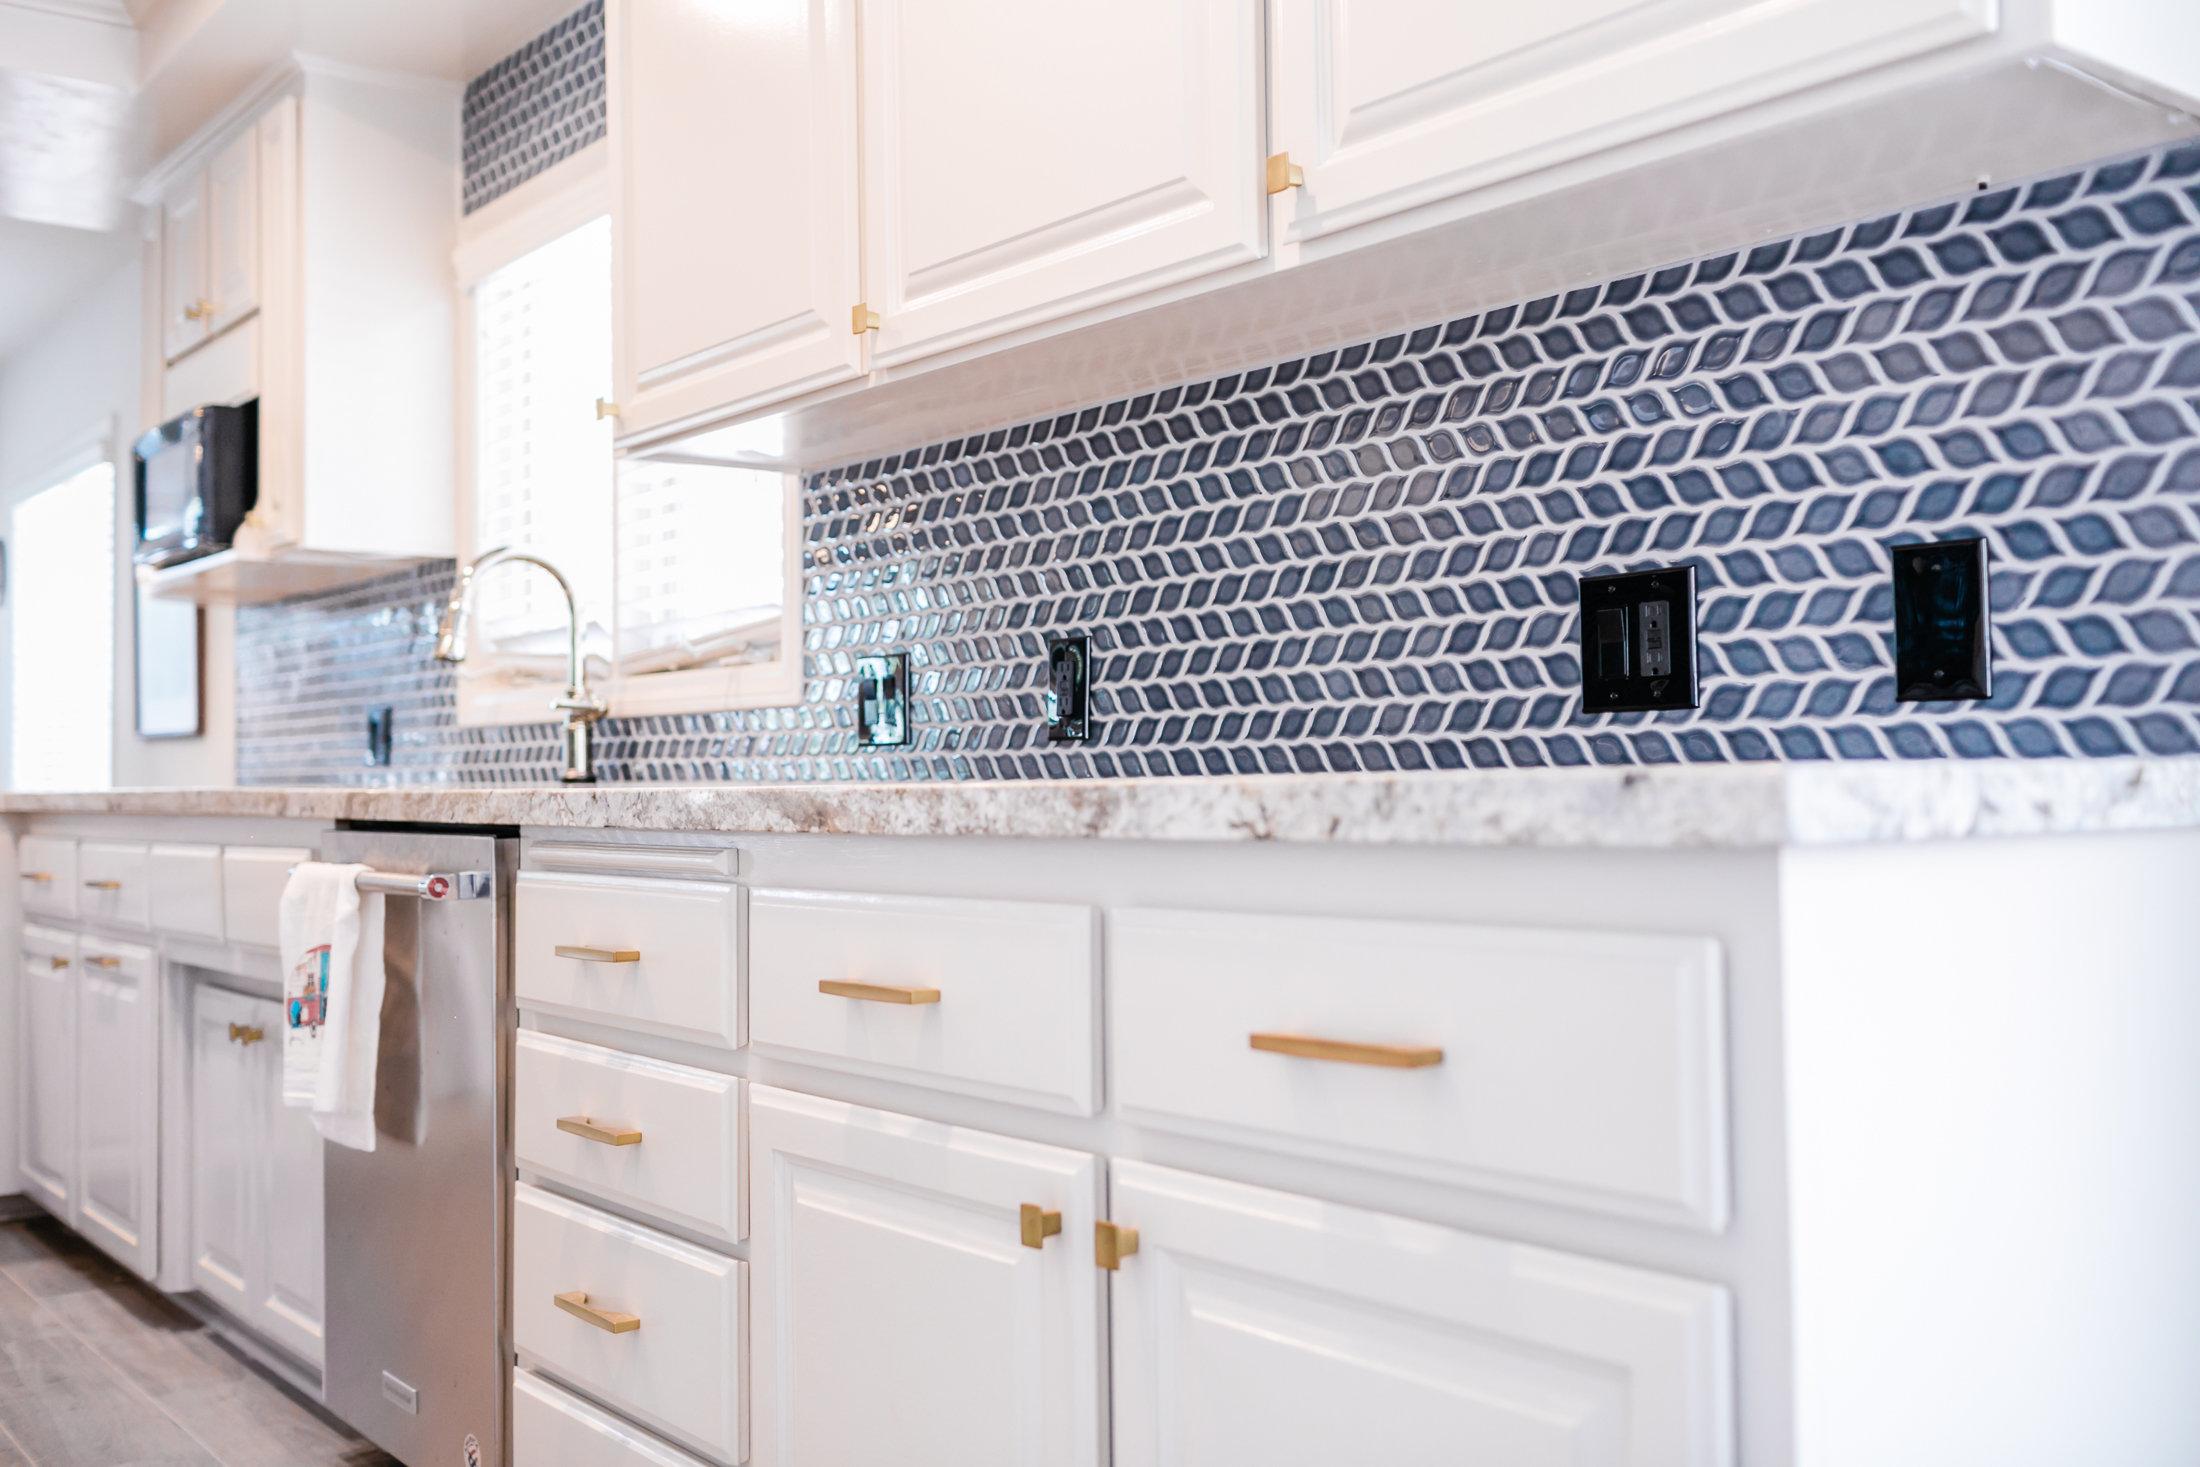 very blue kitchen, Kitchen, Dining Room, remodel, painted ceiling, dmv interior designer, bowie maryland, washington dc, pulls